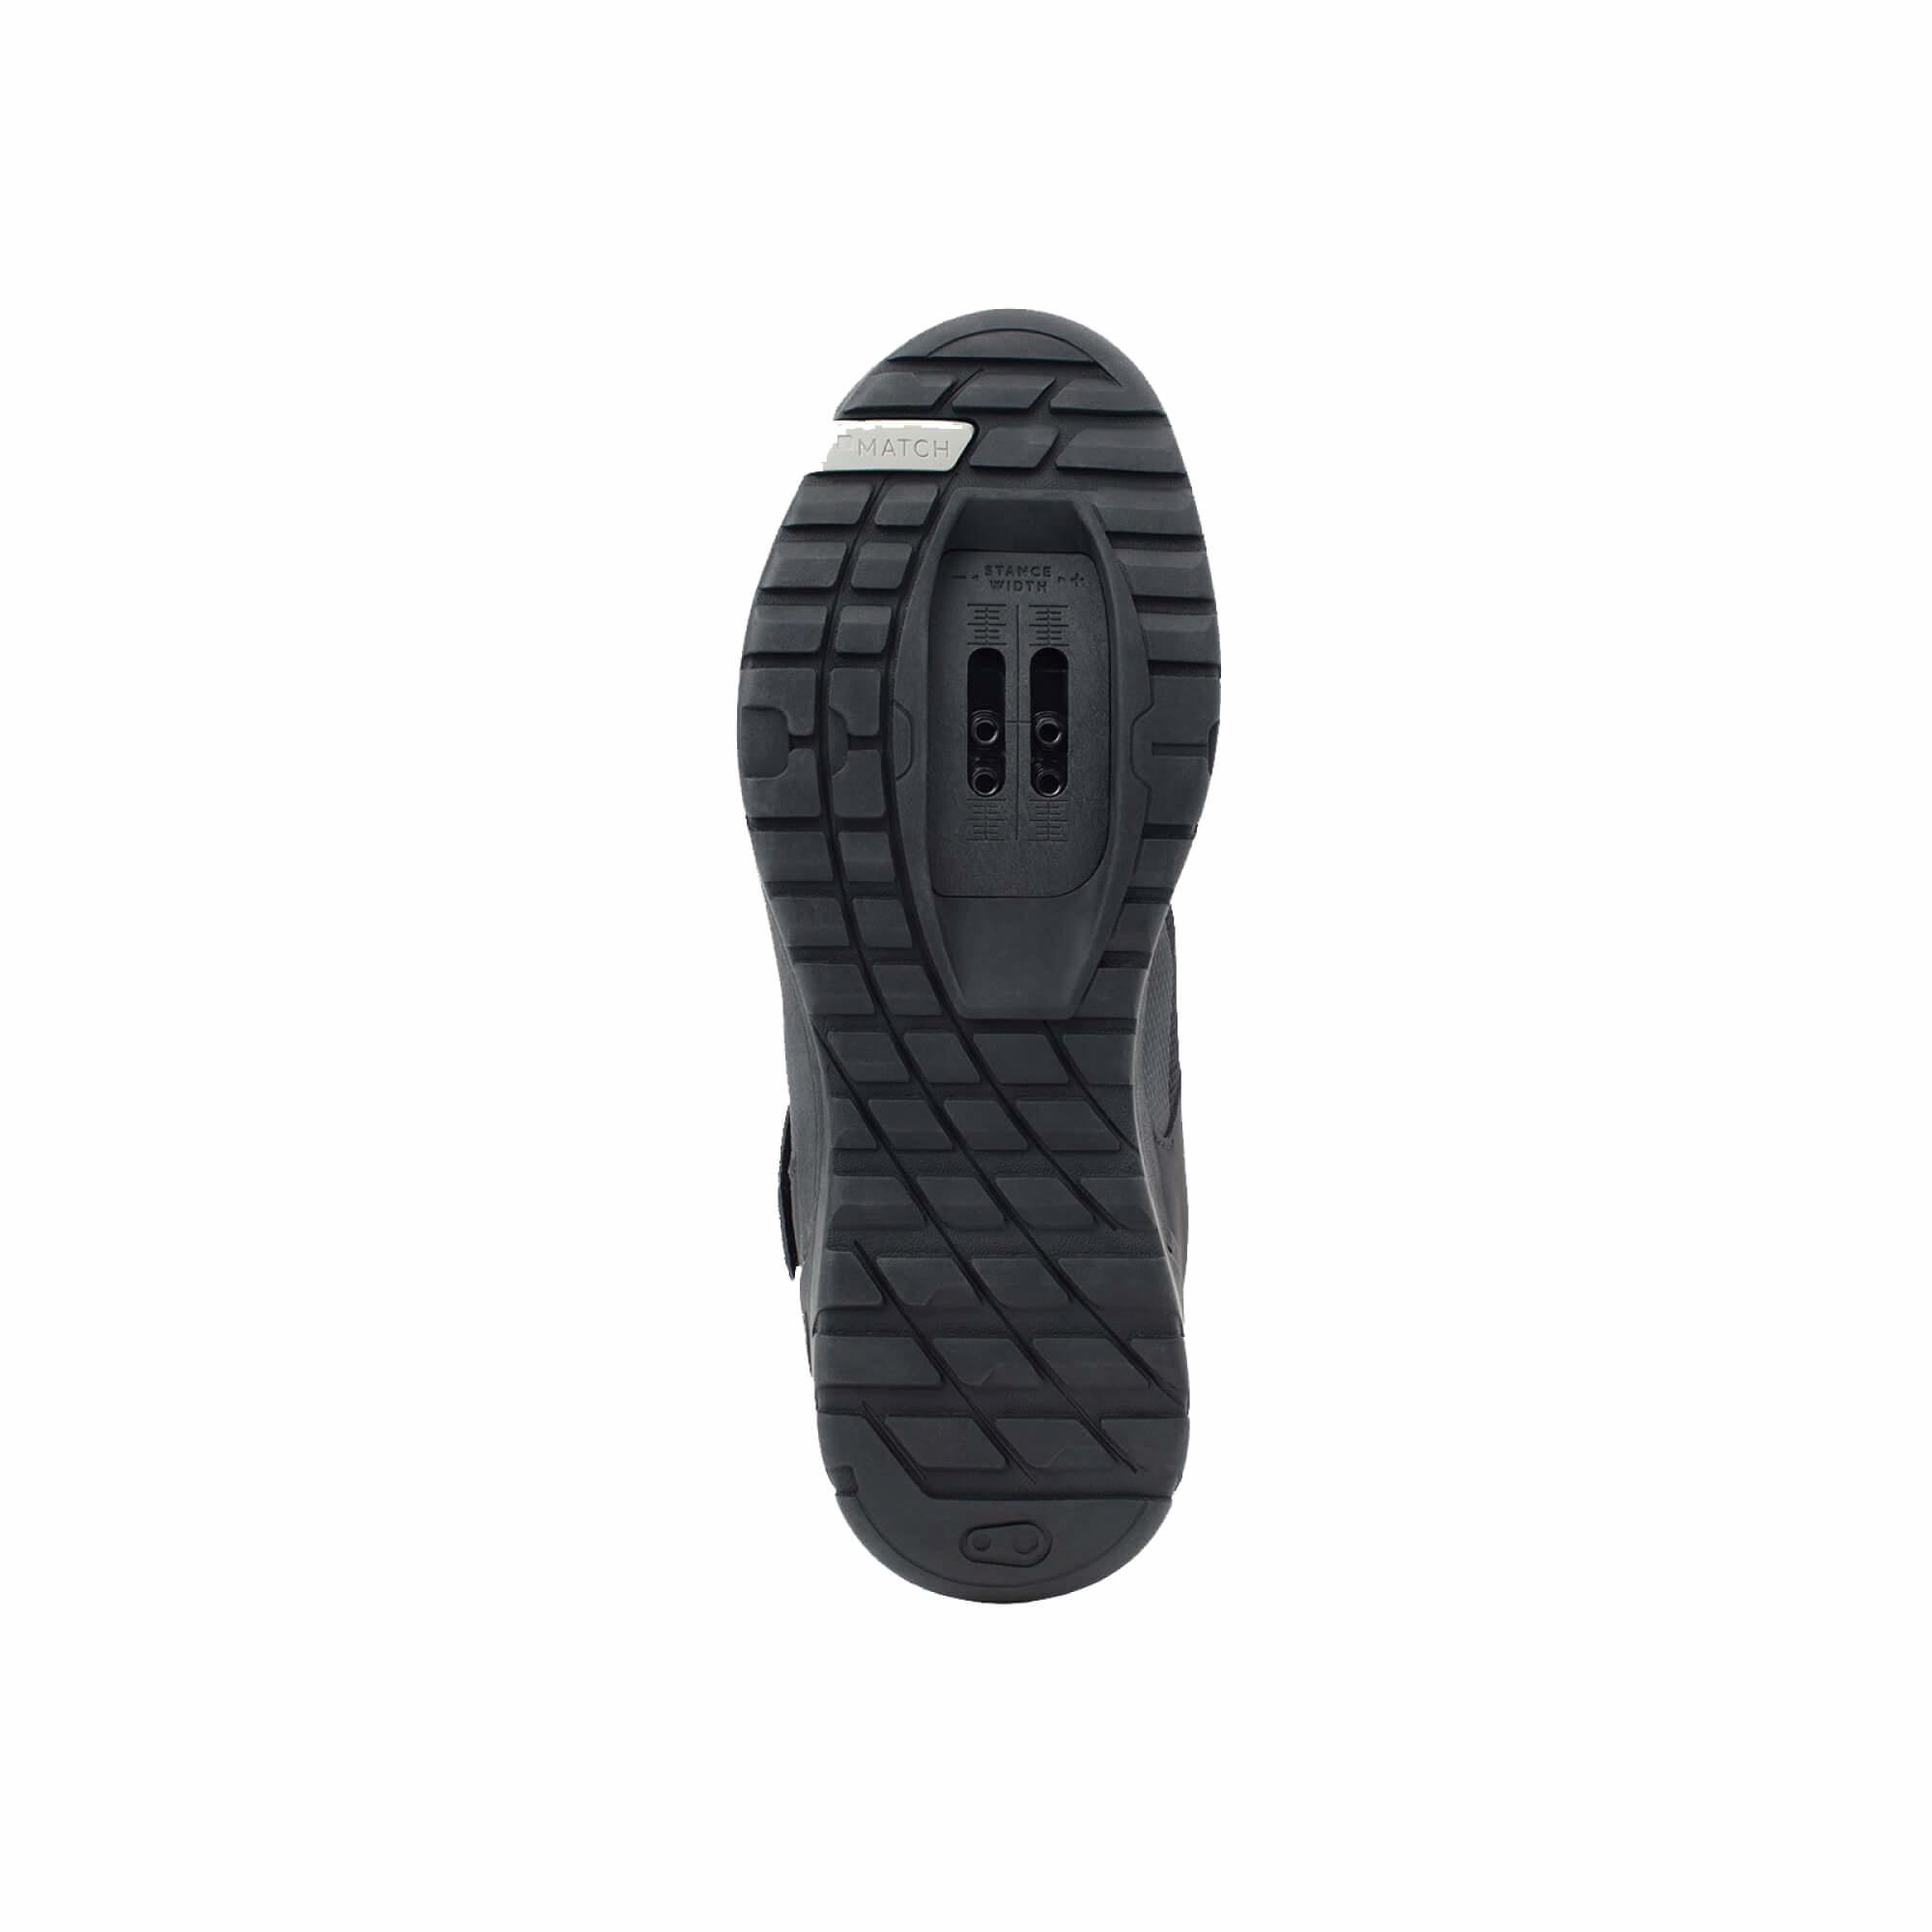 Shoes Mallet Speedlace Clipless Spd-4